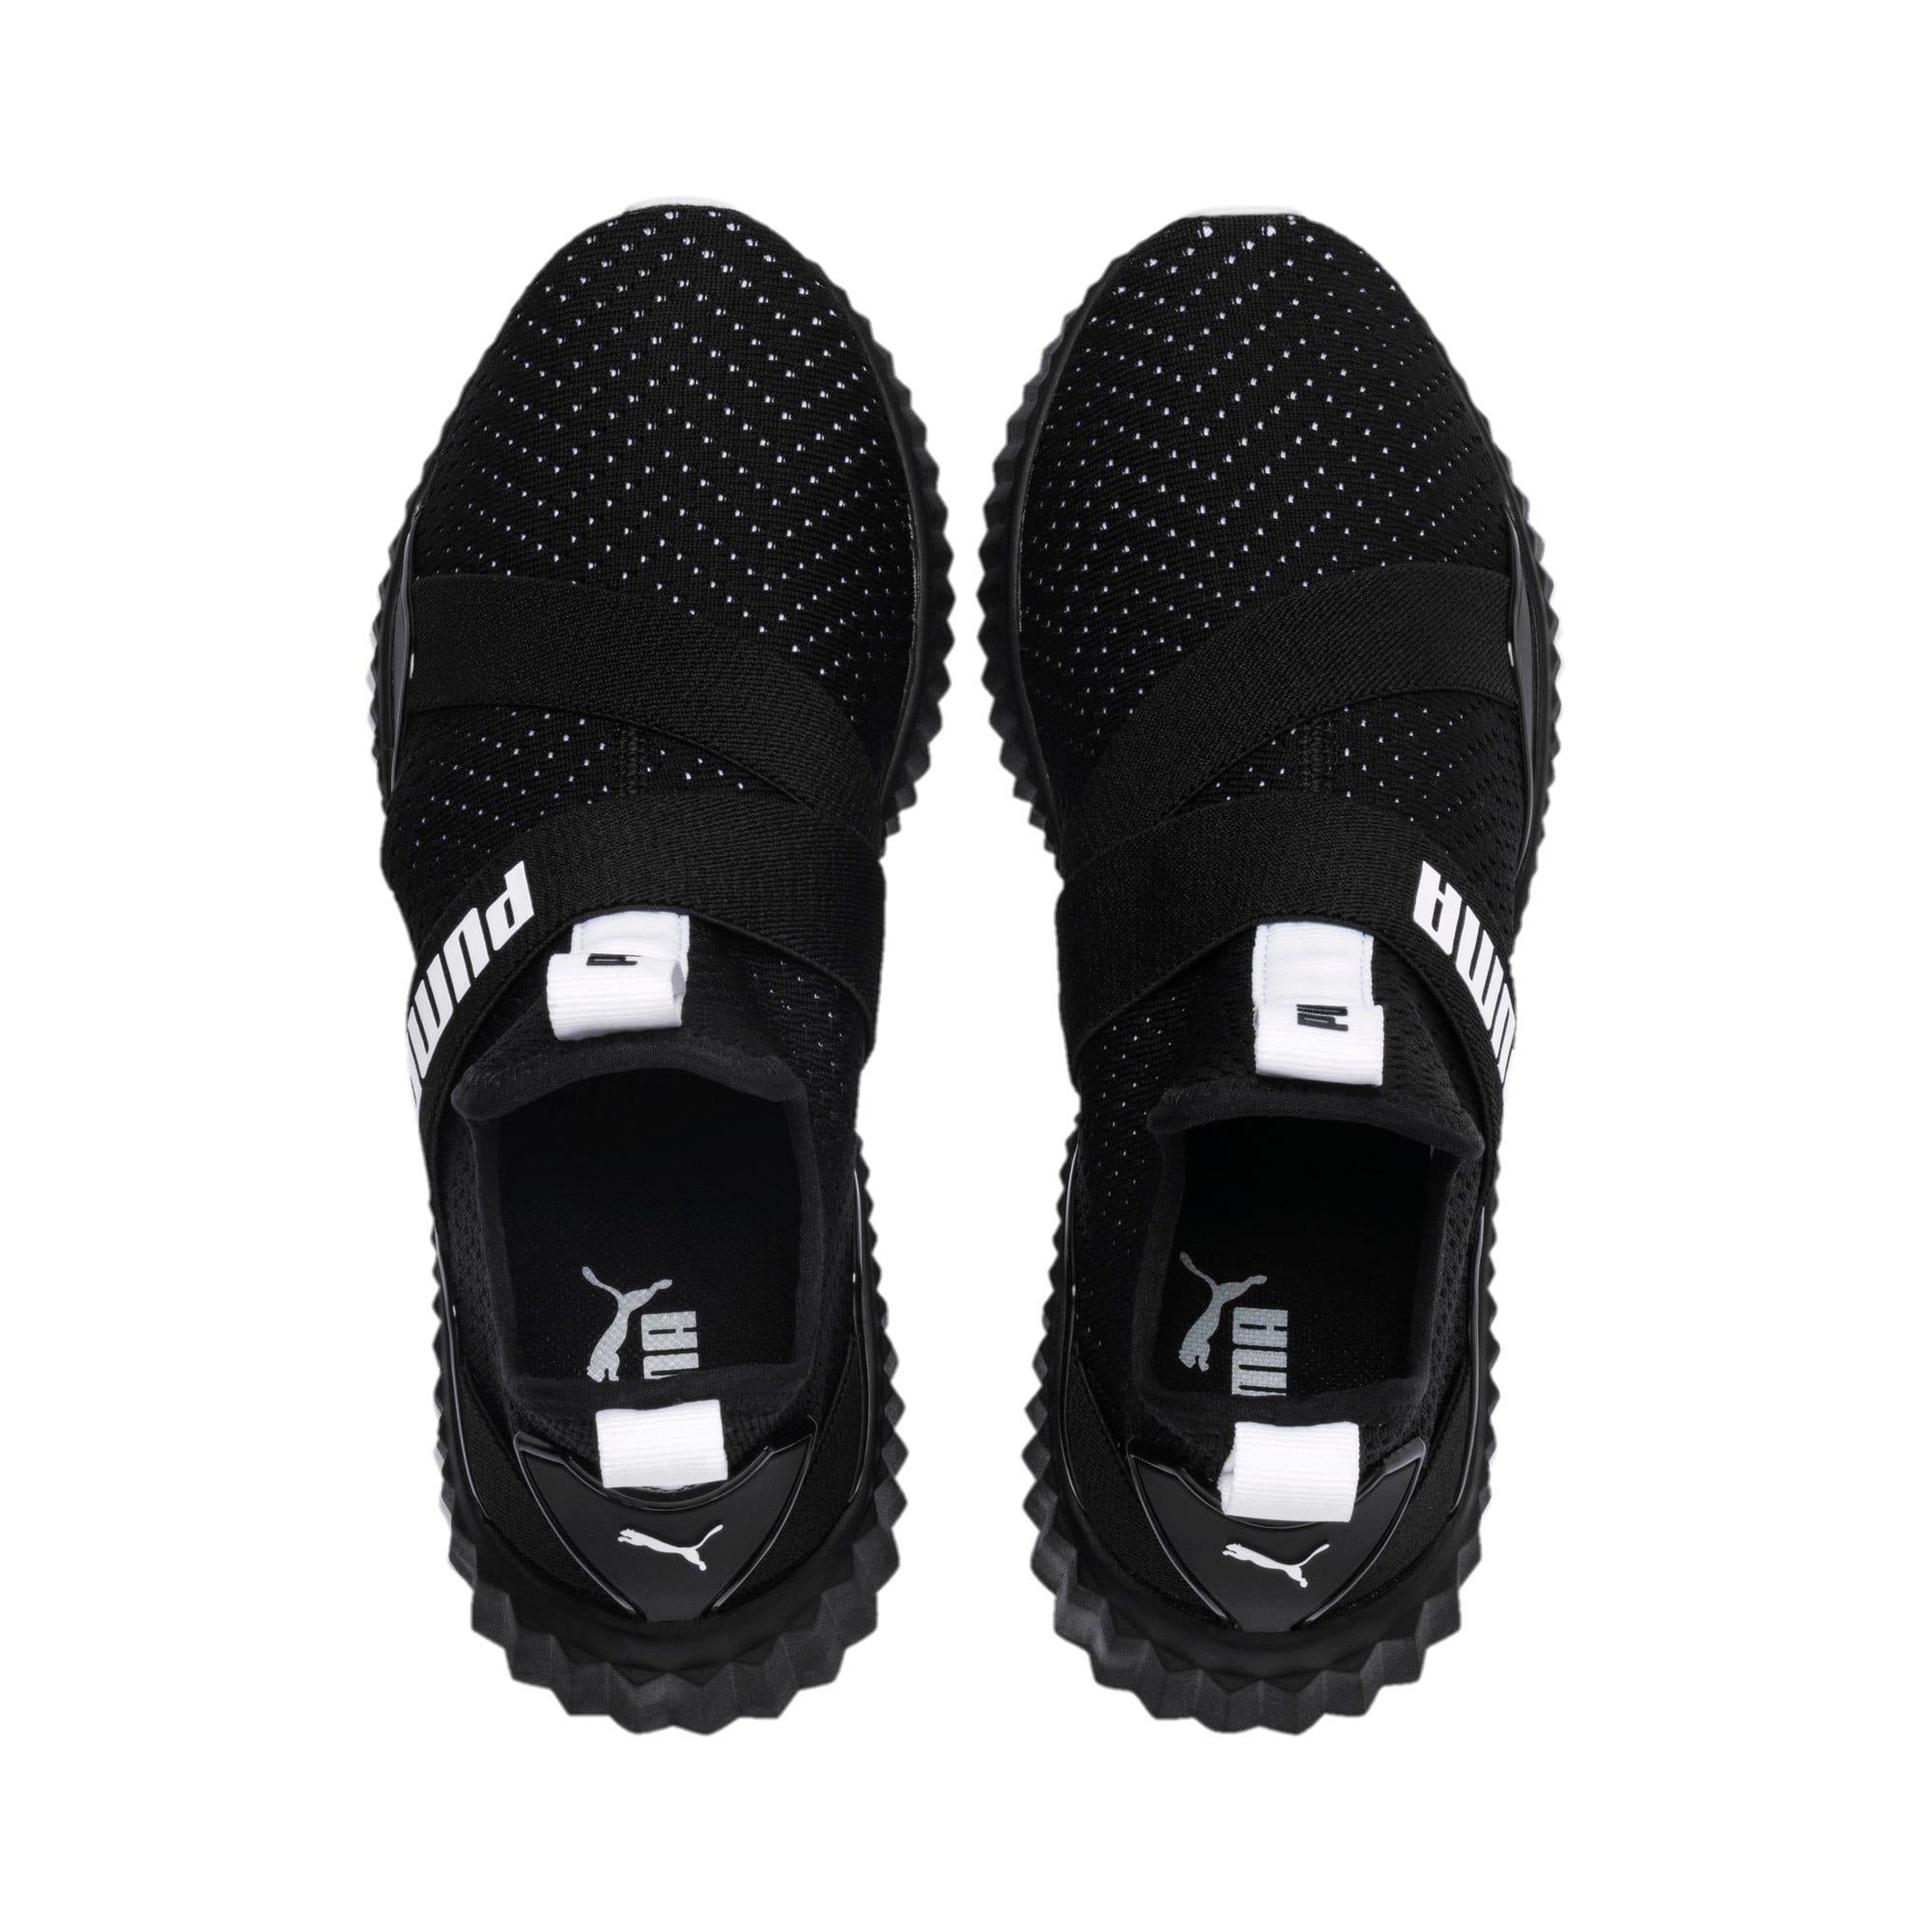 Thumbnail 7 of Defy Mid Core Women's Training Shoes, Puma Black-Puma White, medium